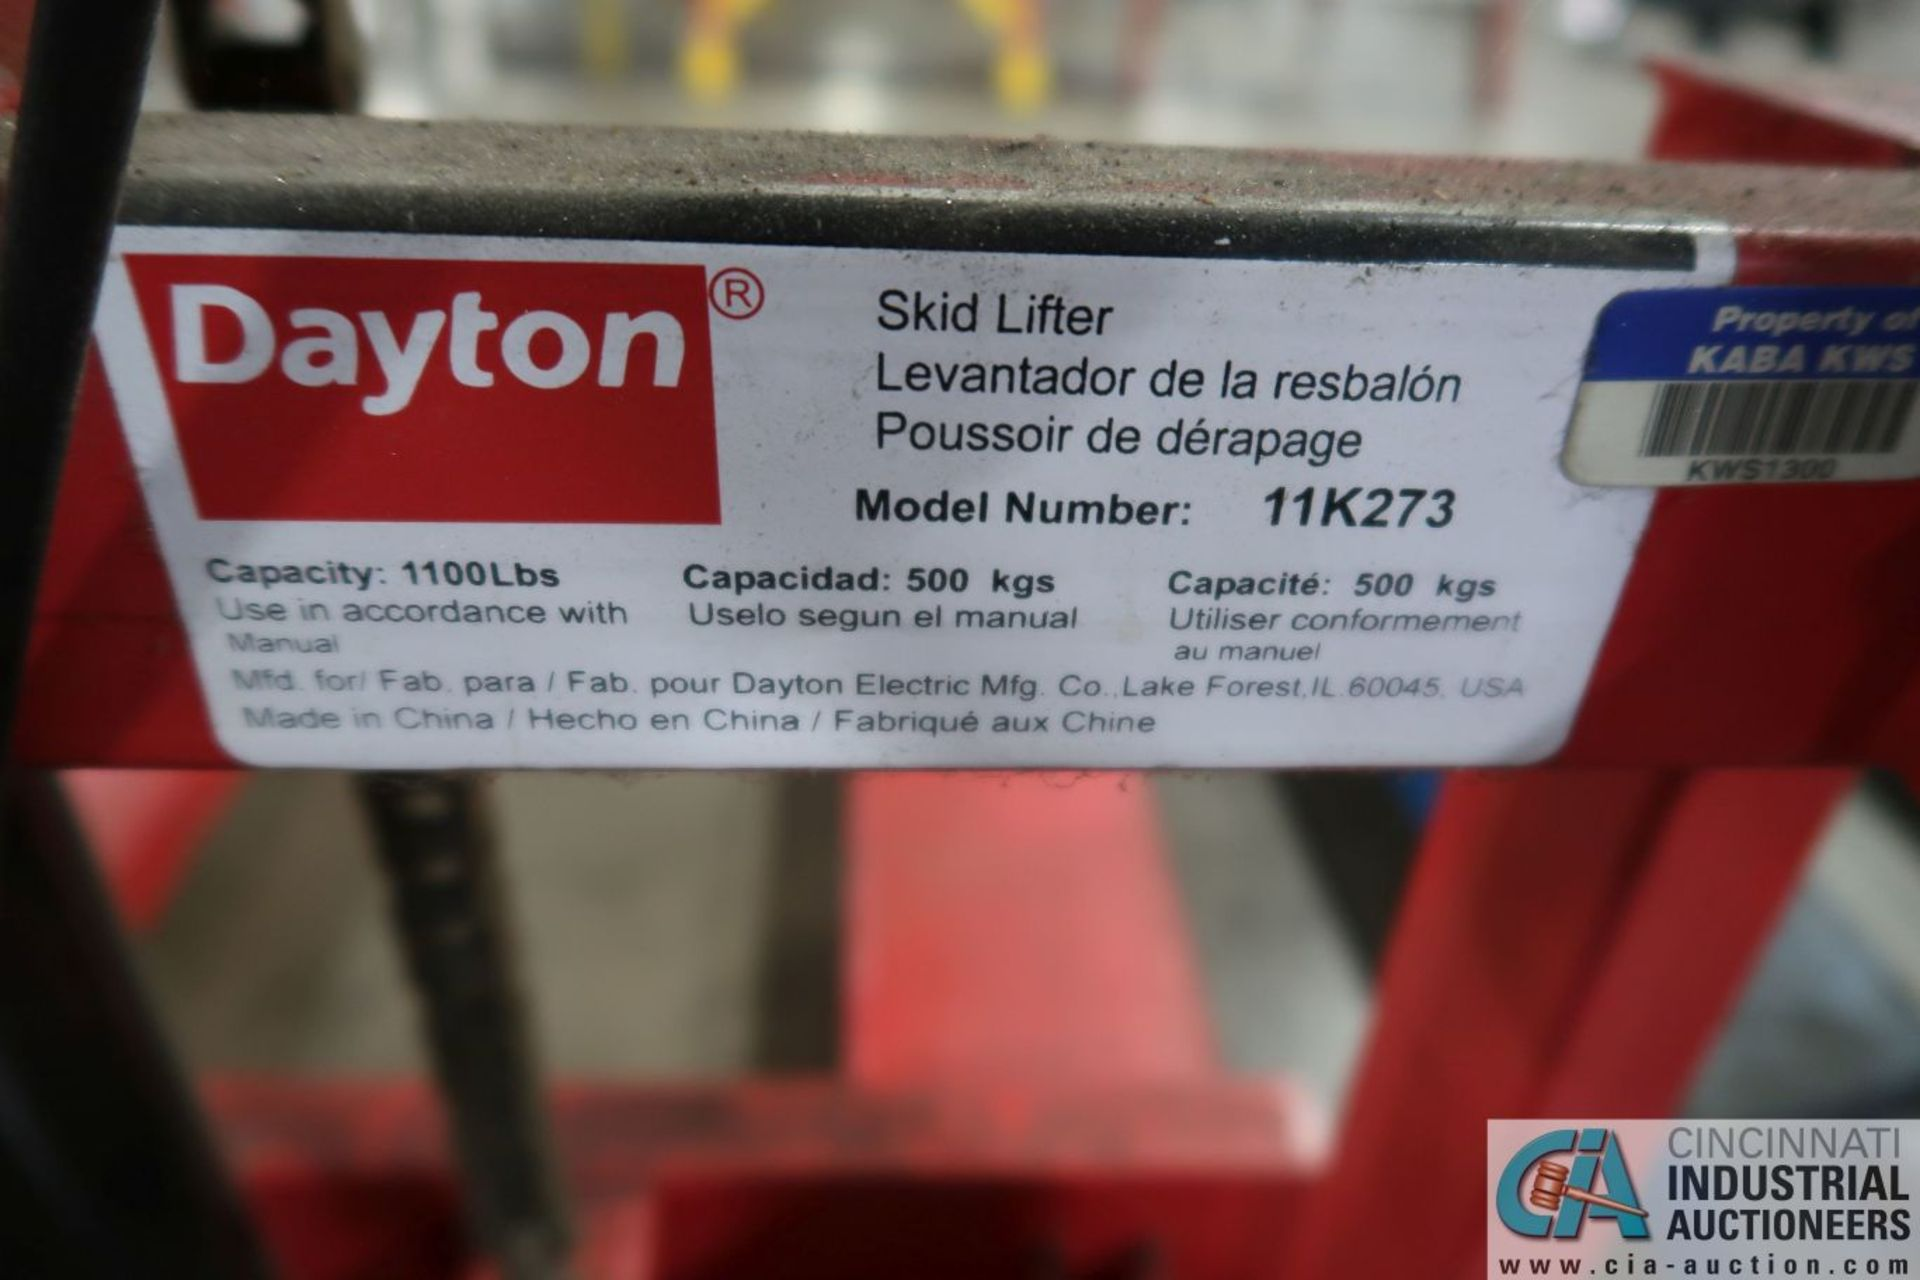 1,100 LB. CAPACITY DAYTON MODEL 11K273 SKID LIFTER - Image 3 of 3